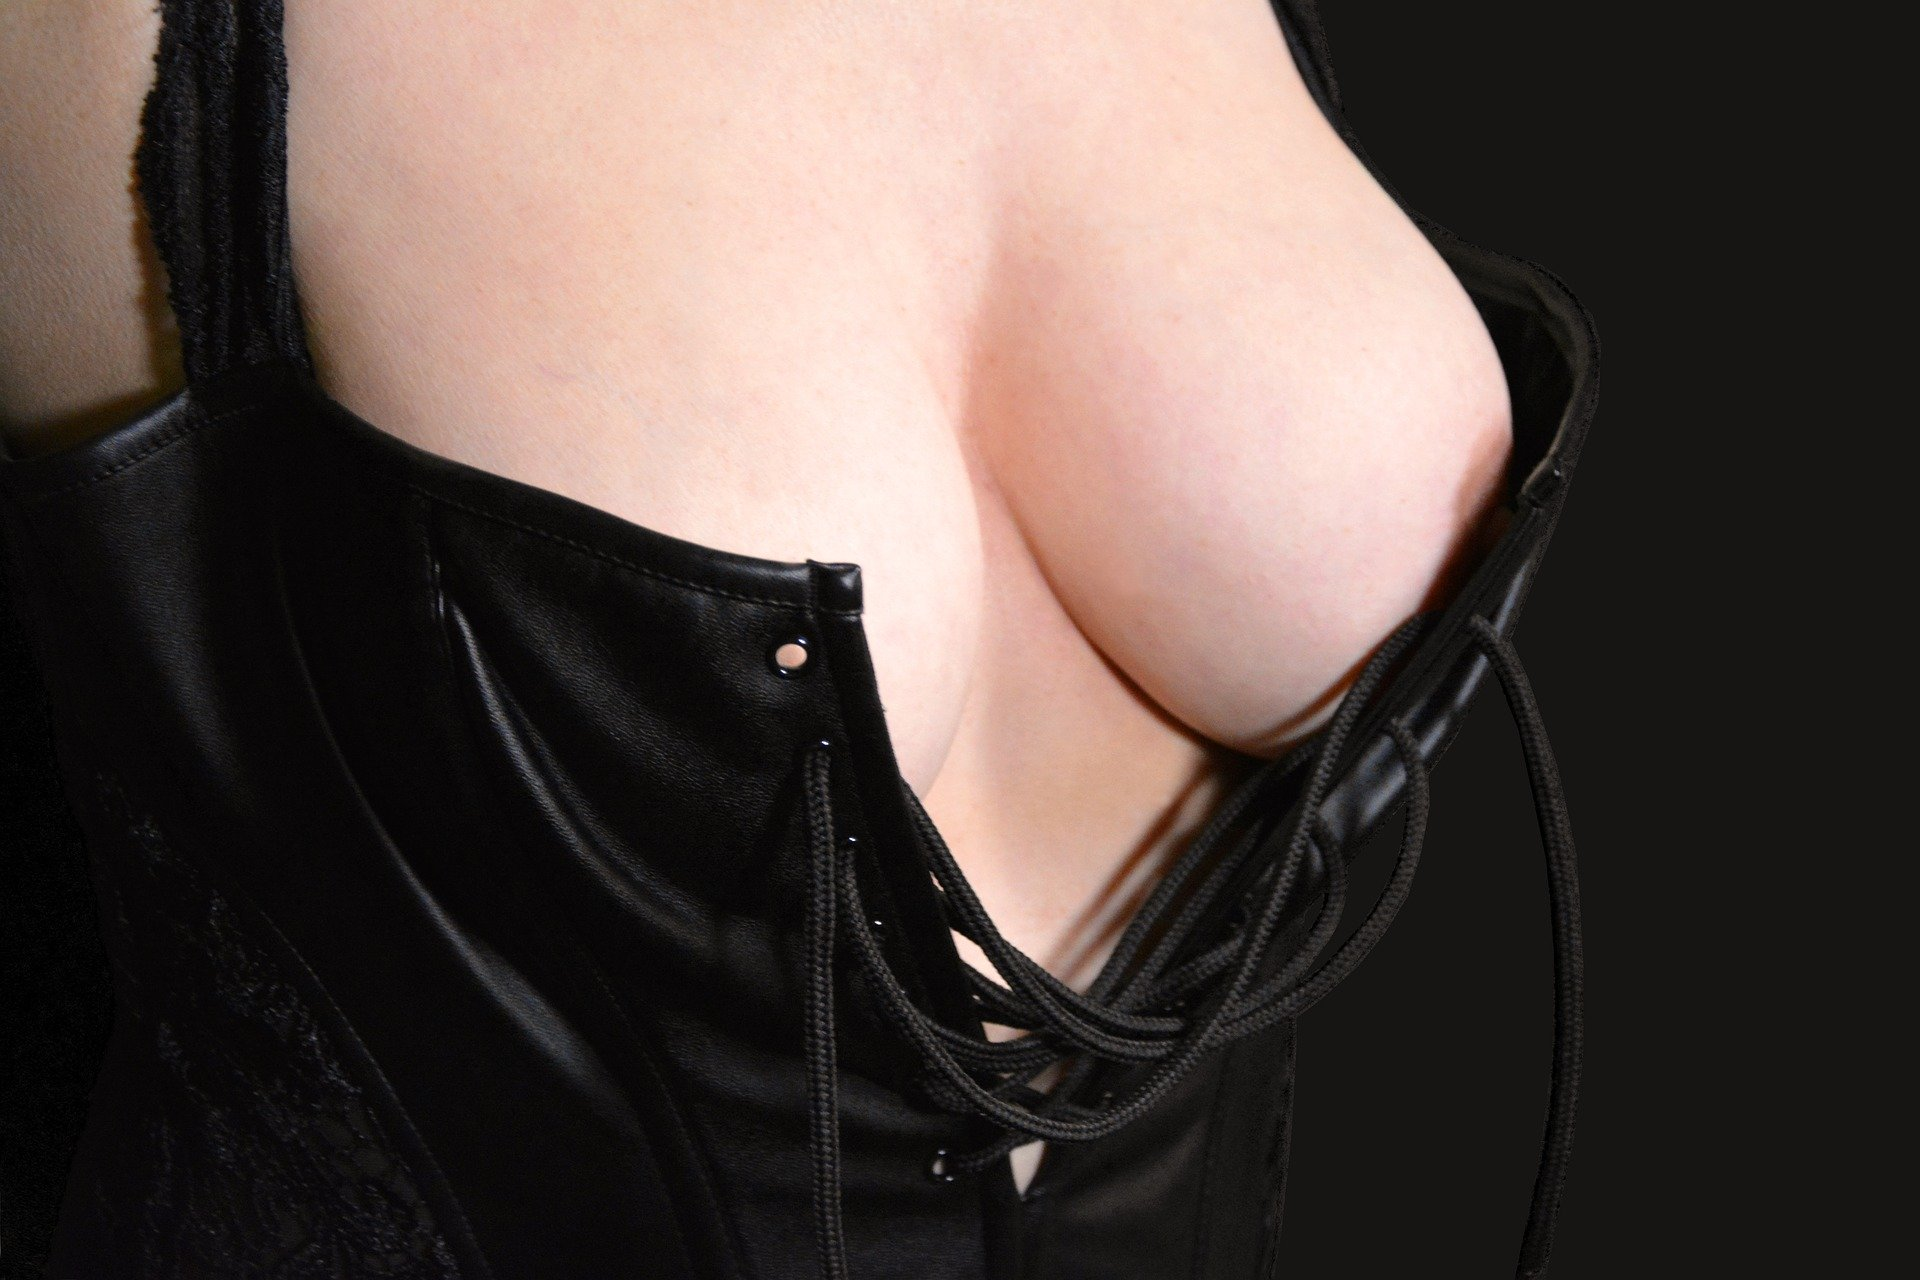 breasts 2293508 1920 - 【18禁】オススメの無料エロ動画サイト20選